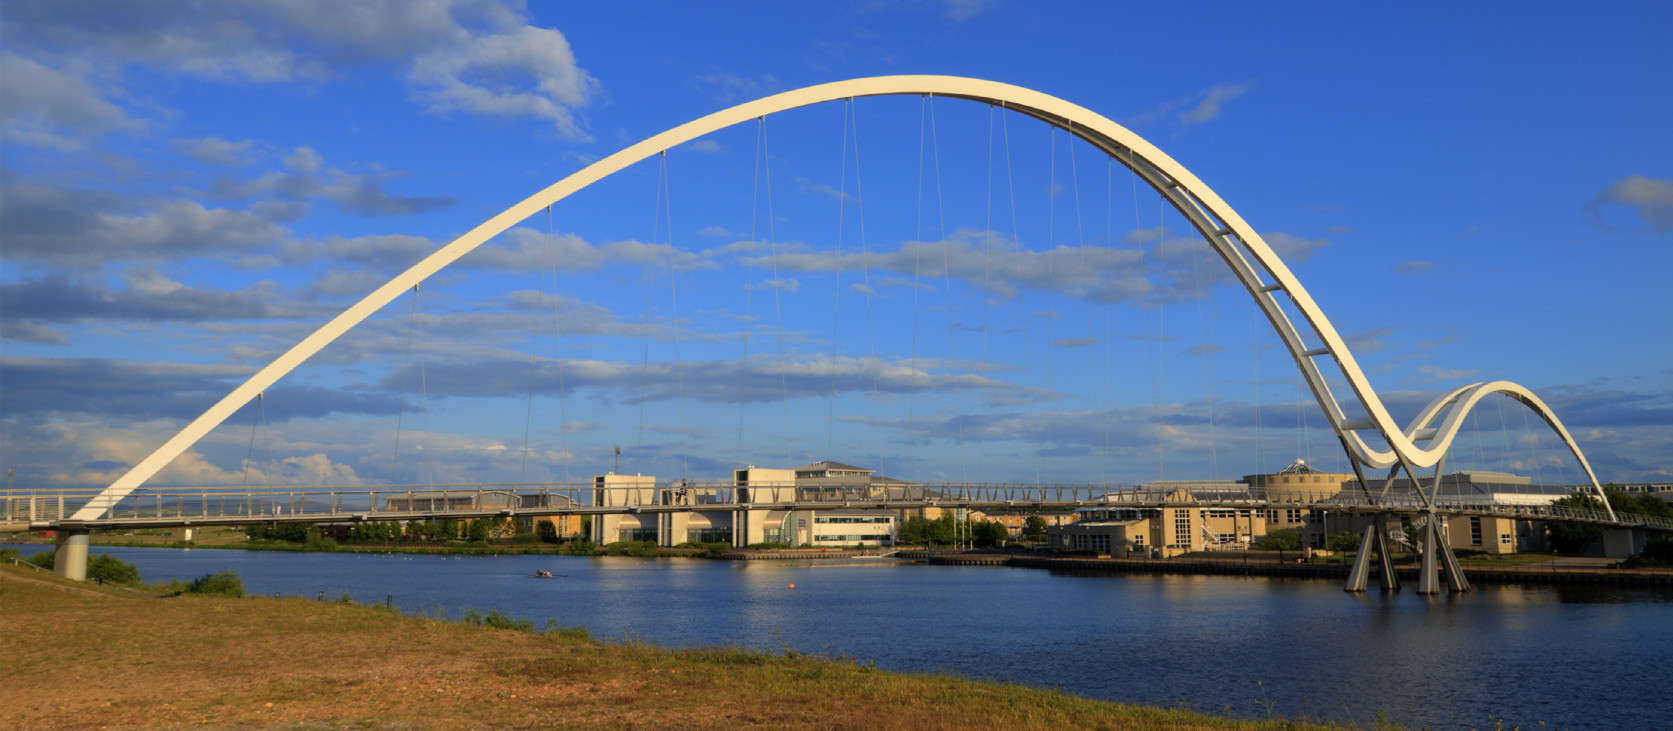 Teesside Infinity Bridge